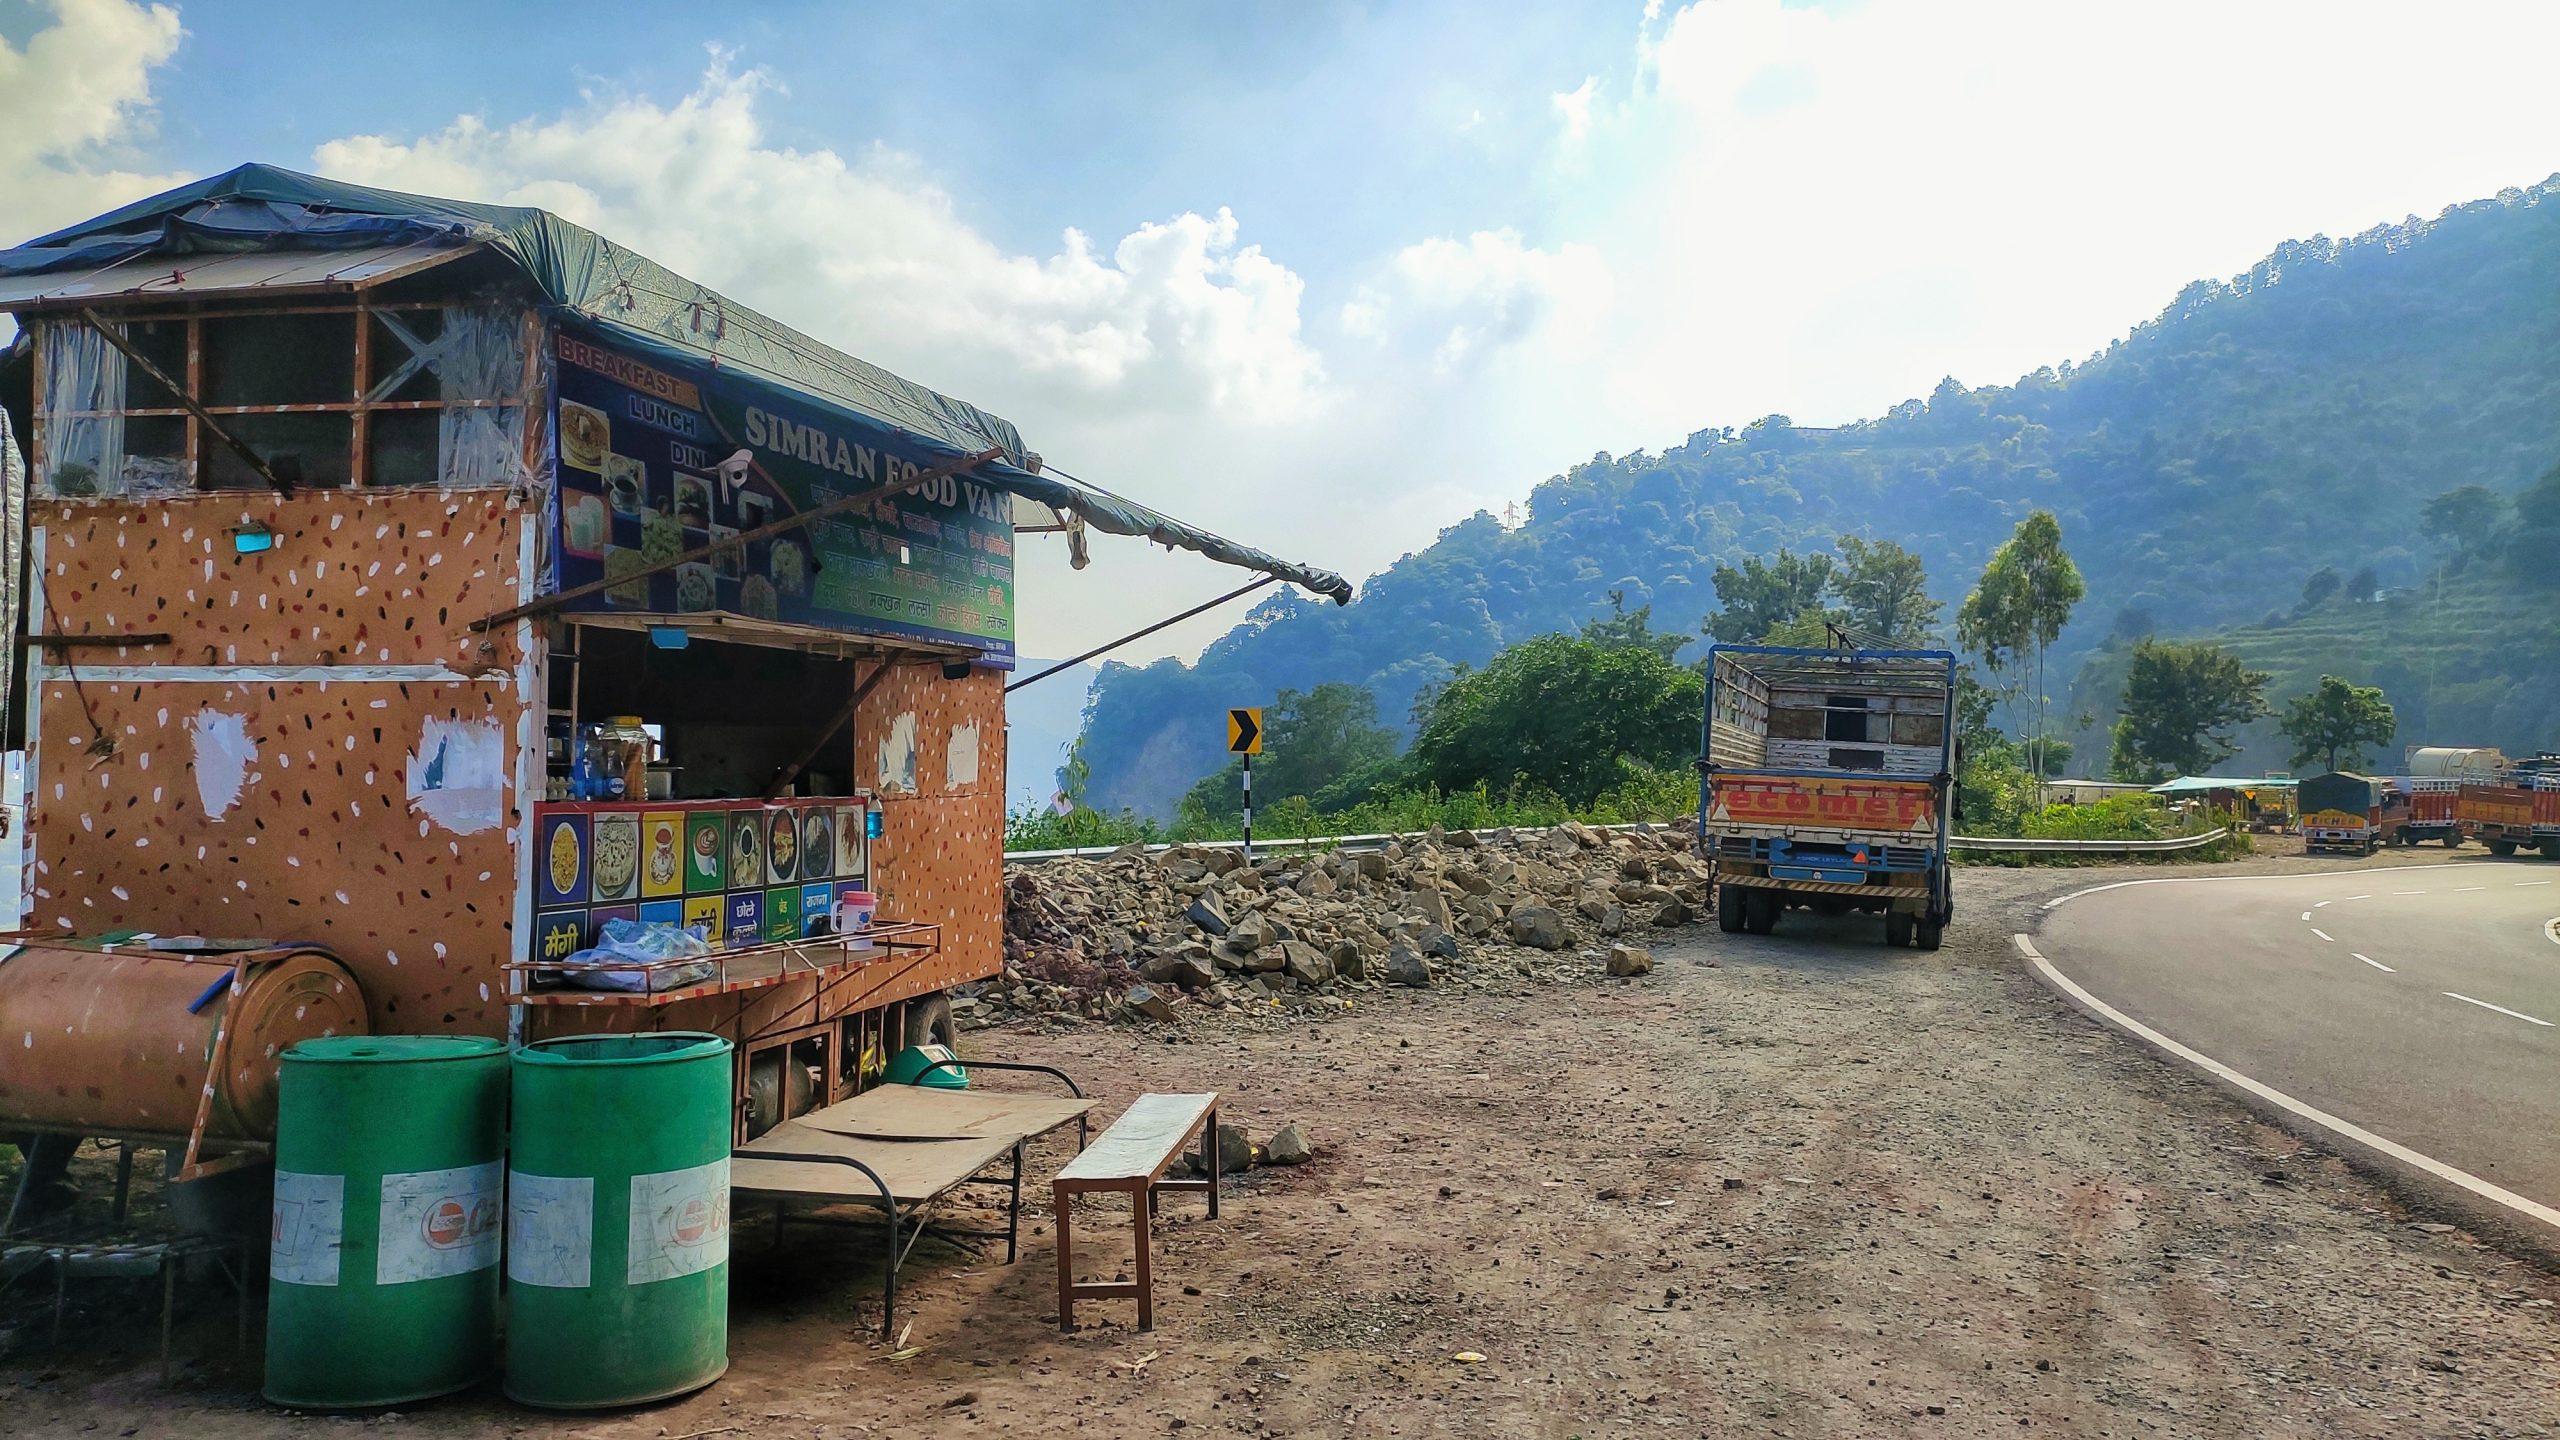 A mini food hut beside a road